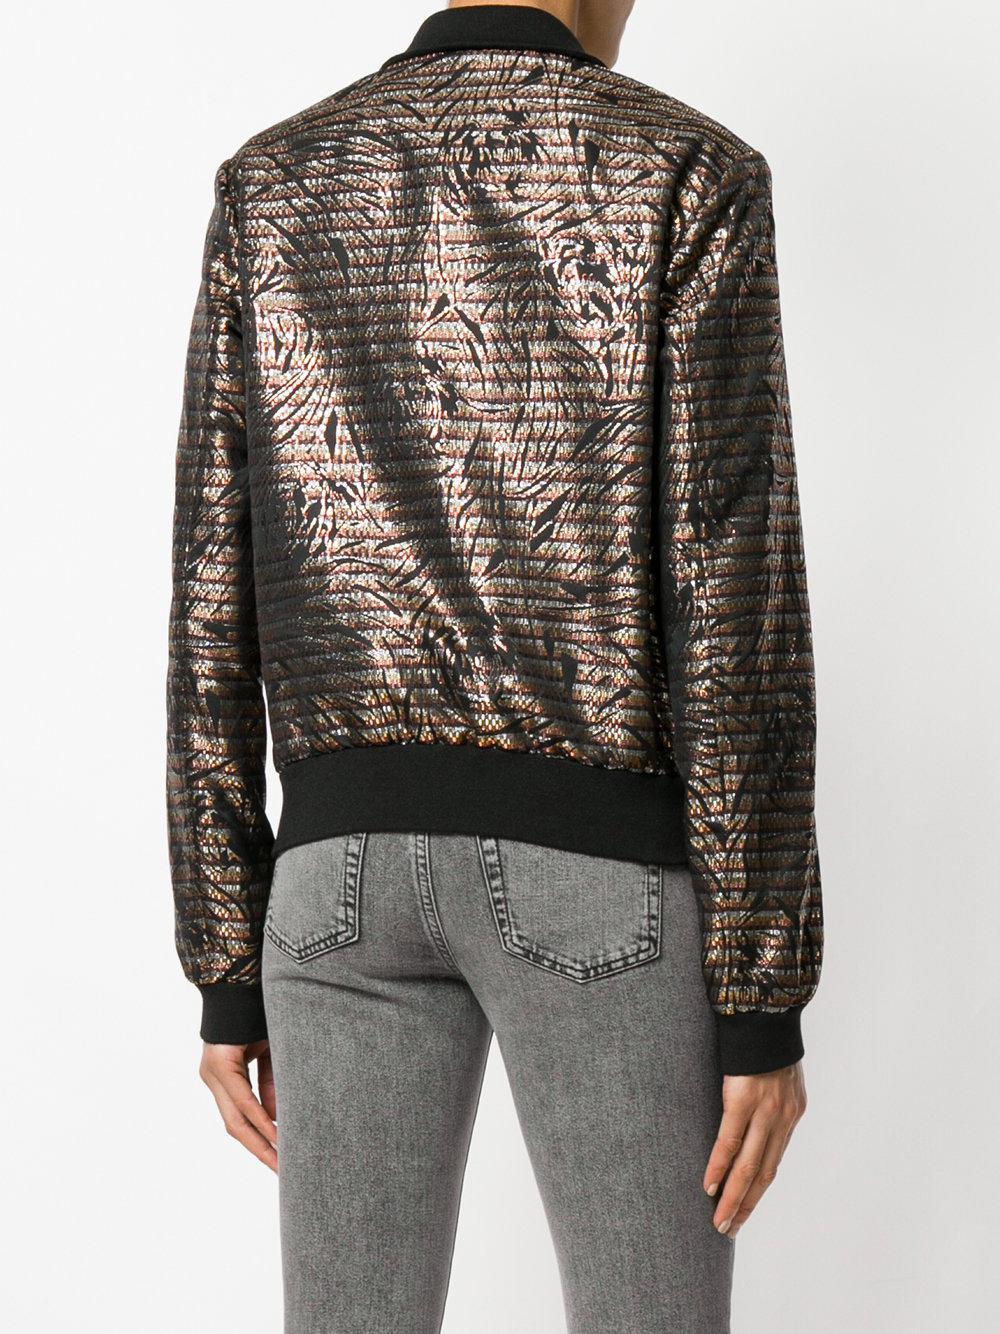 embroidered fitted bomber jacket - Black Saint Laurent Outlet Big Sale Inexpensive For Sale Fake HKnigWKq